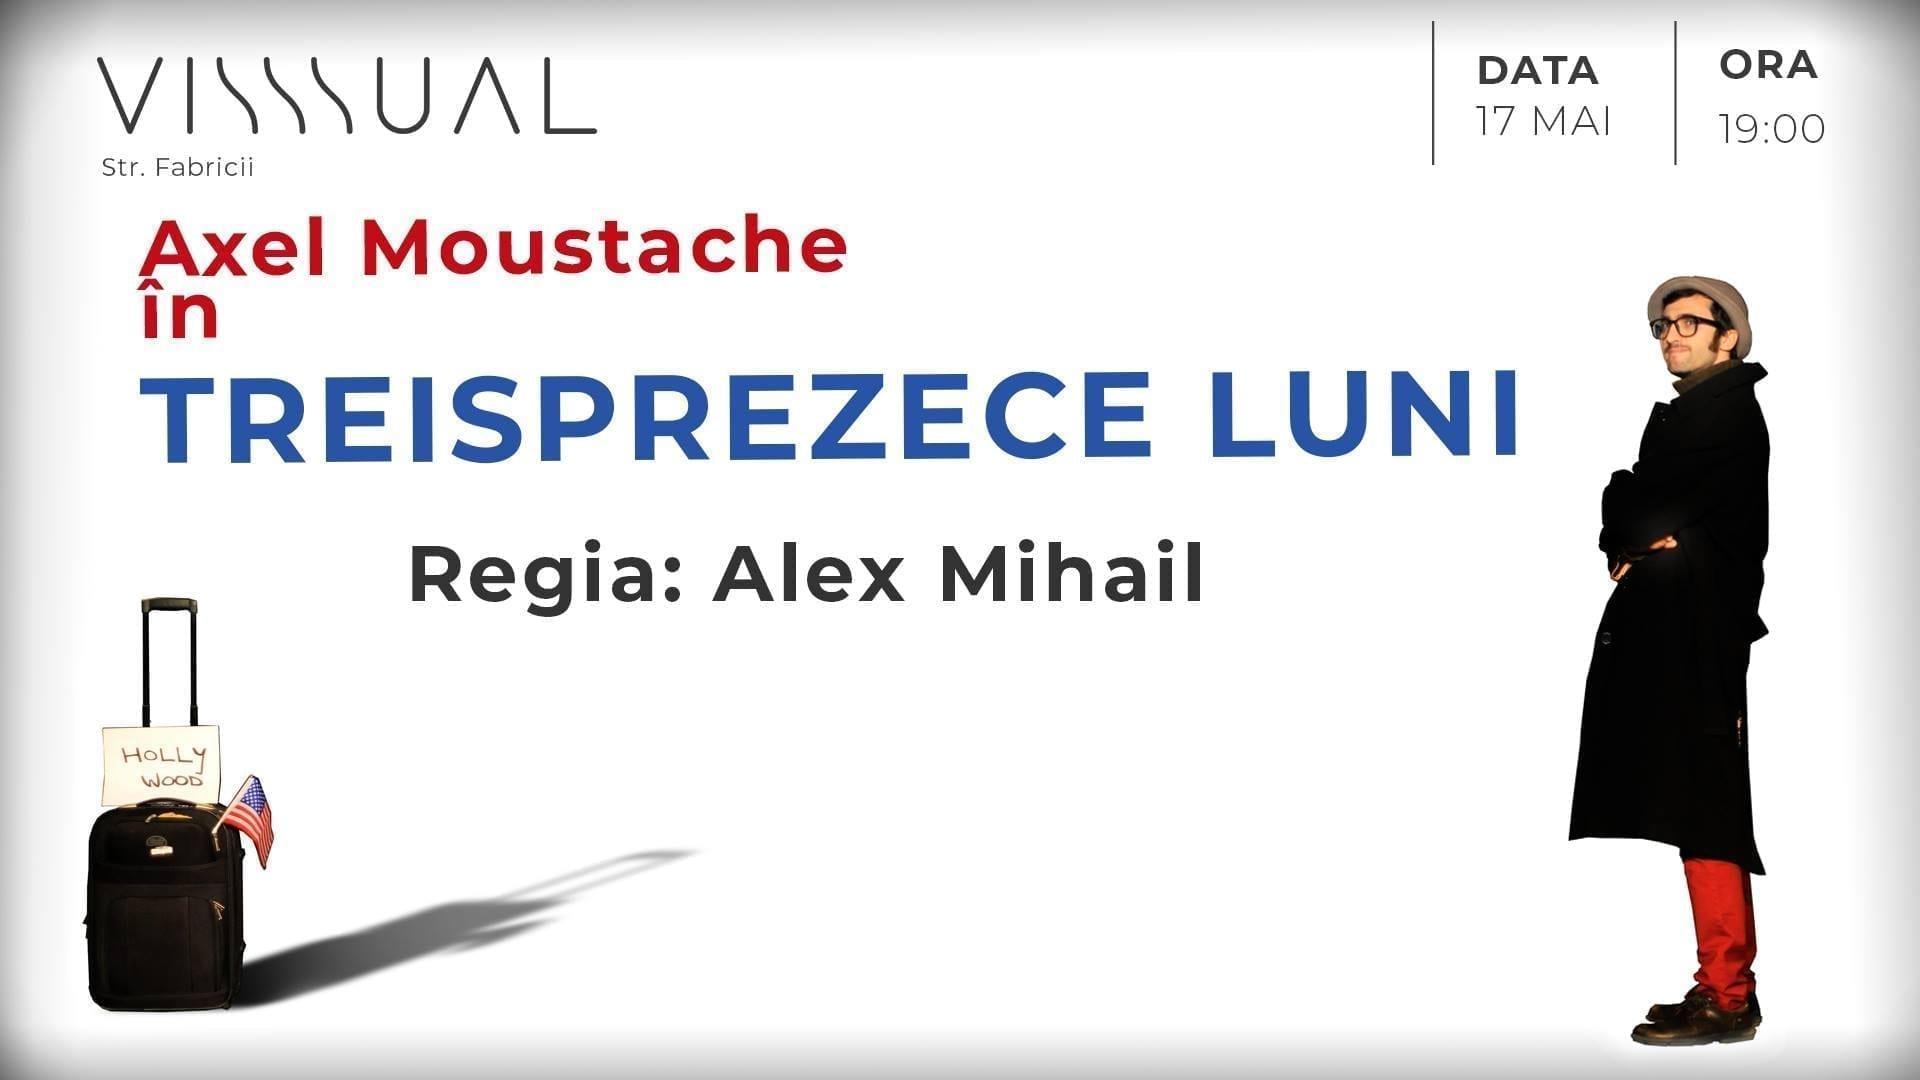 Treisprezece Luni By Axel Moustache [teatru] - Visssual